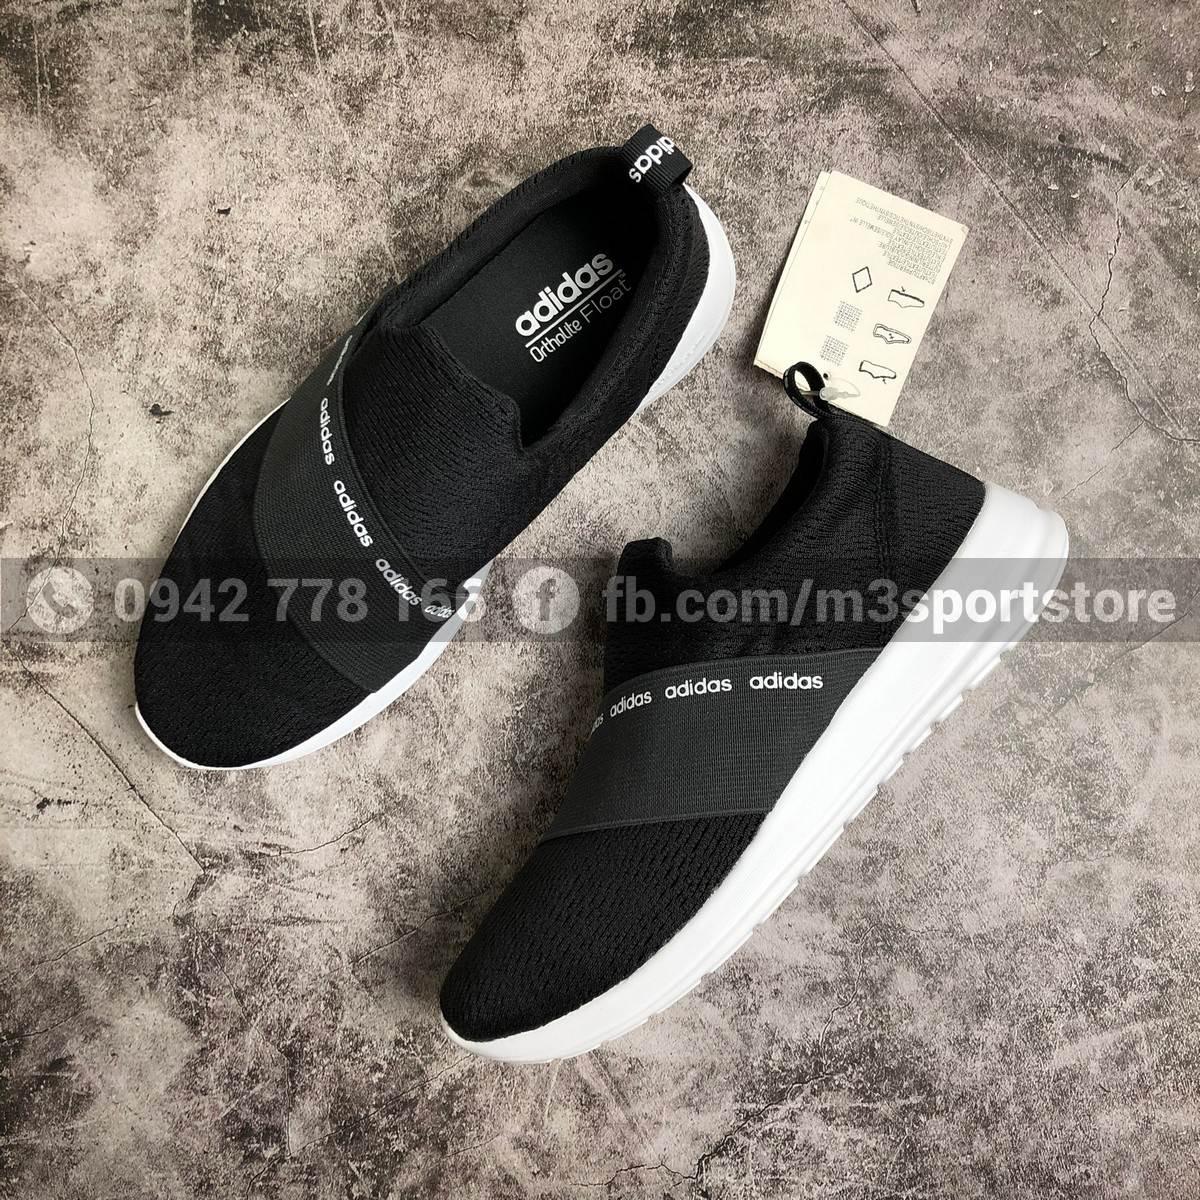 Giày thể thao nữ Adidas Cloudfoam Refine Adapt DB1339